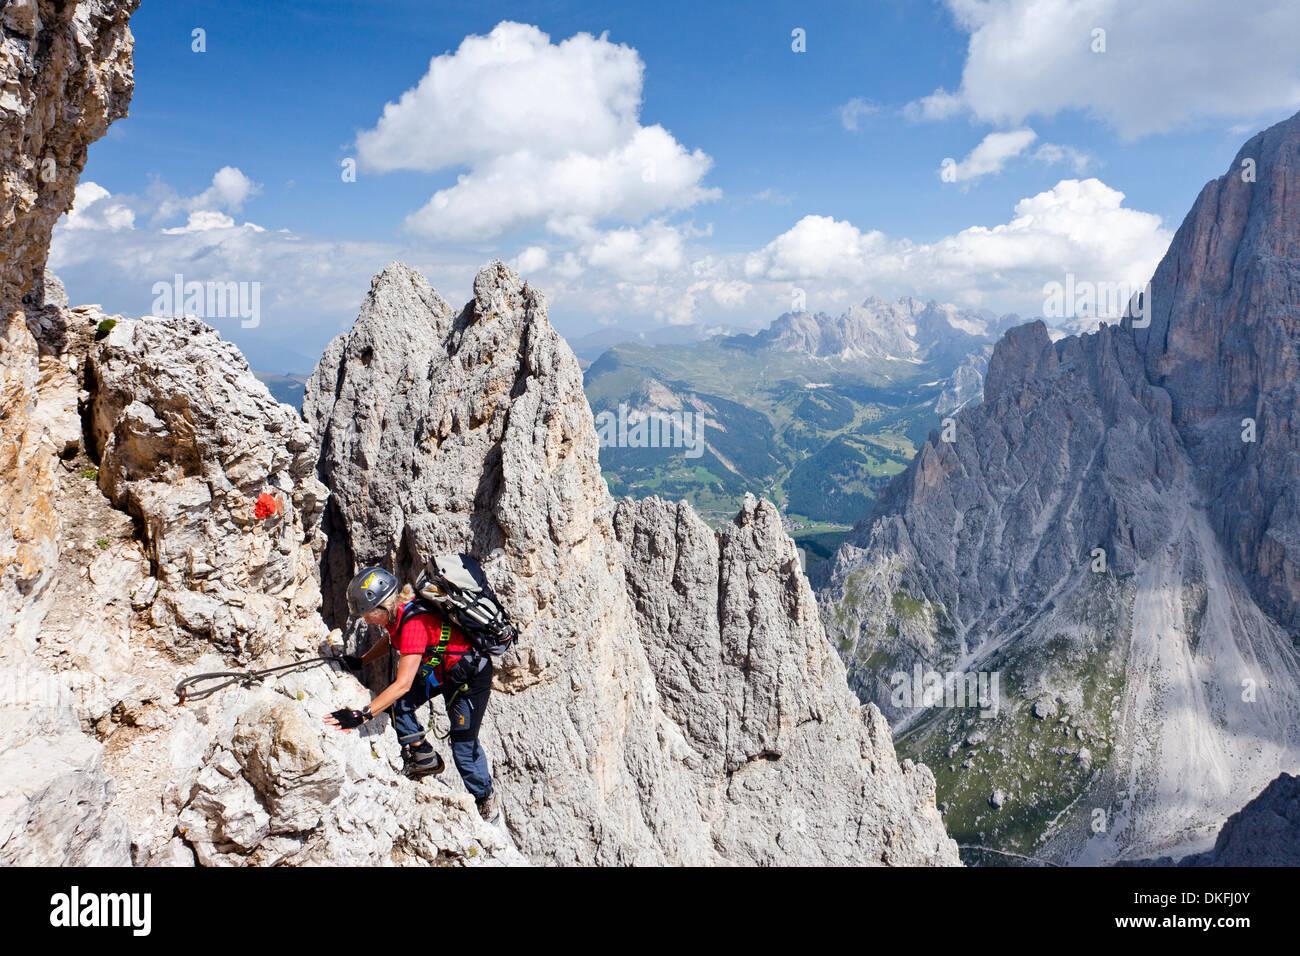 Klettersteig Plattkofel : Bergsteiger aufsteigender plattkofels berg entlang der stieg